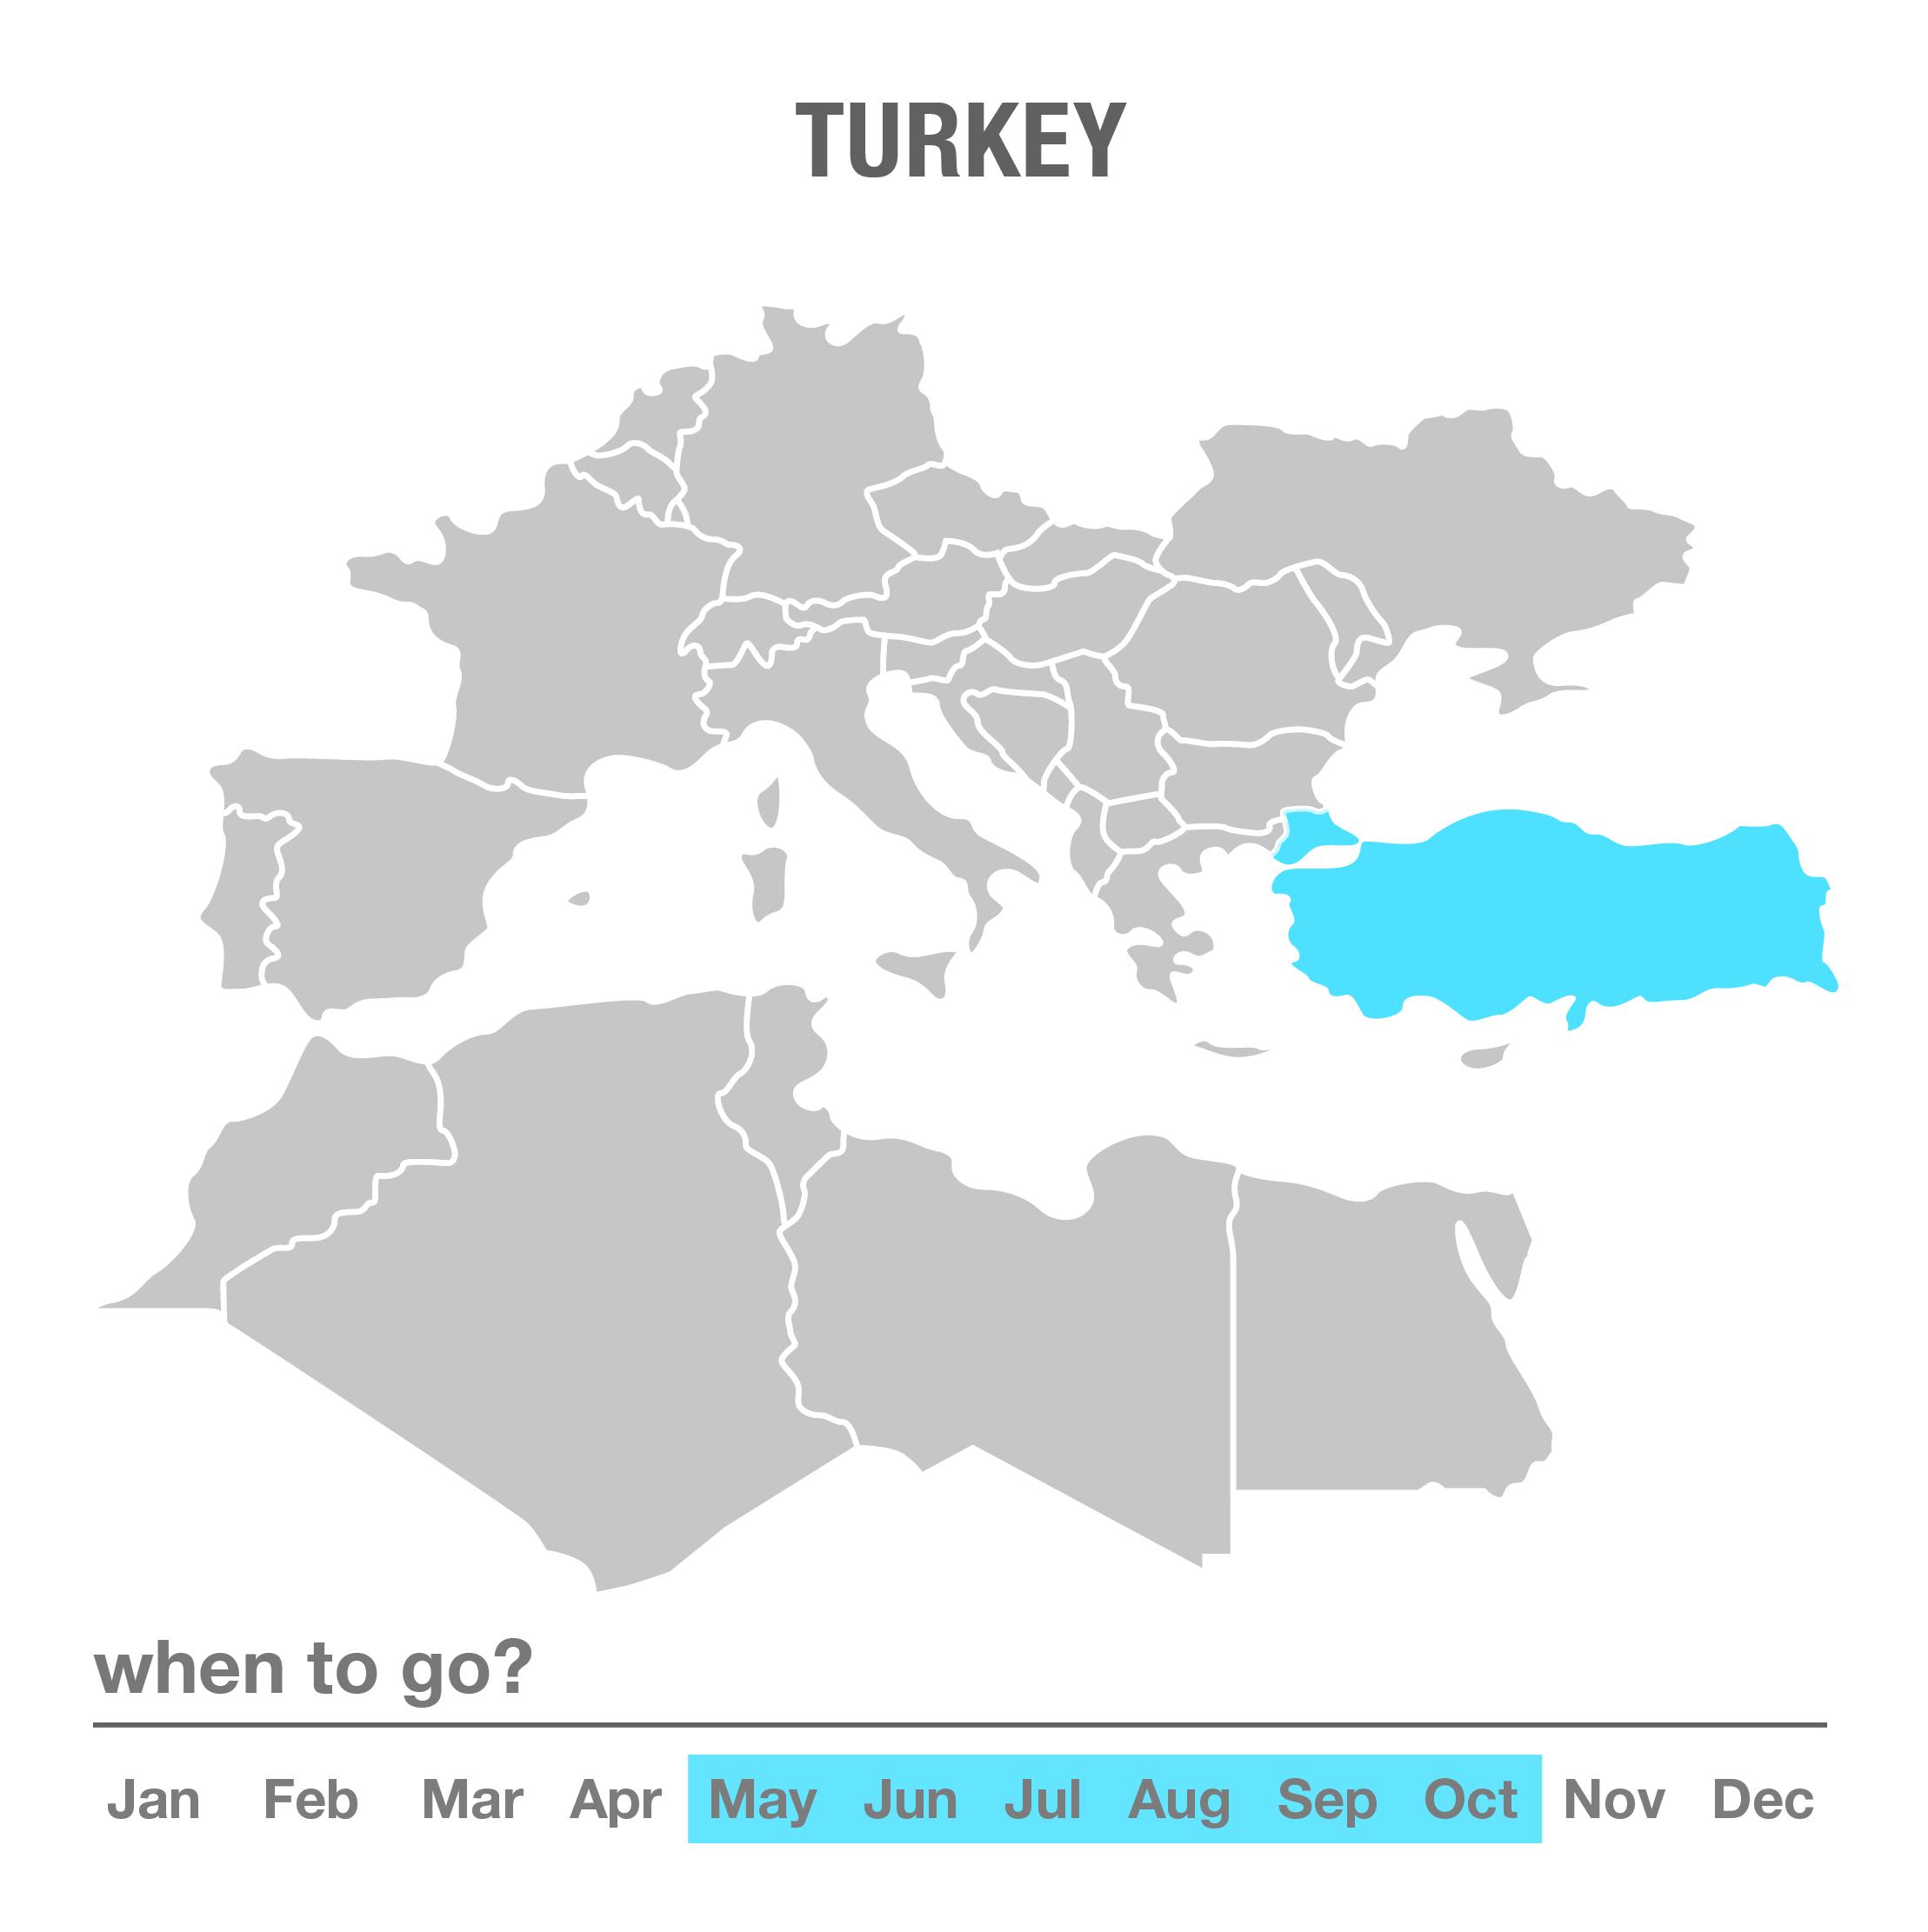 Luxury Tours Turkey